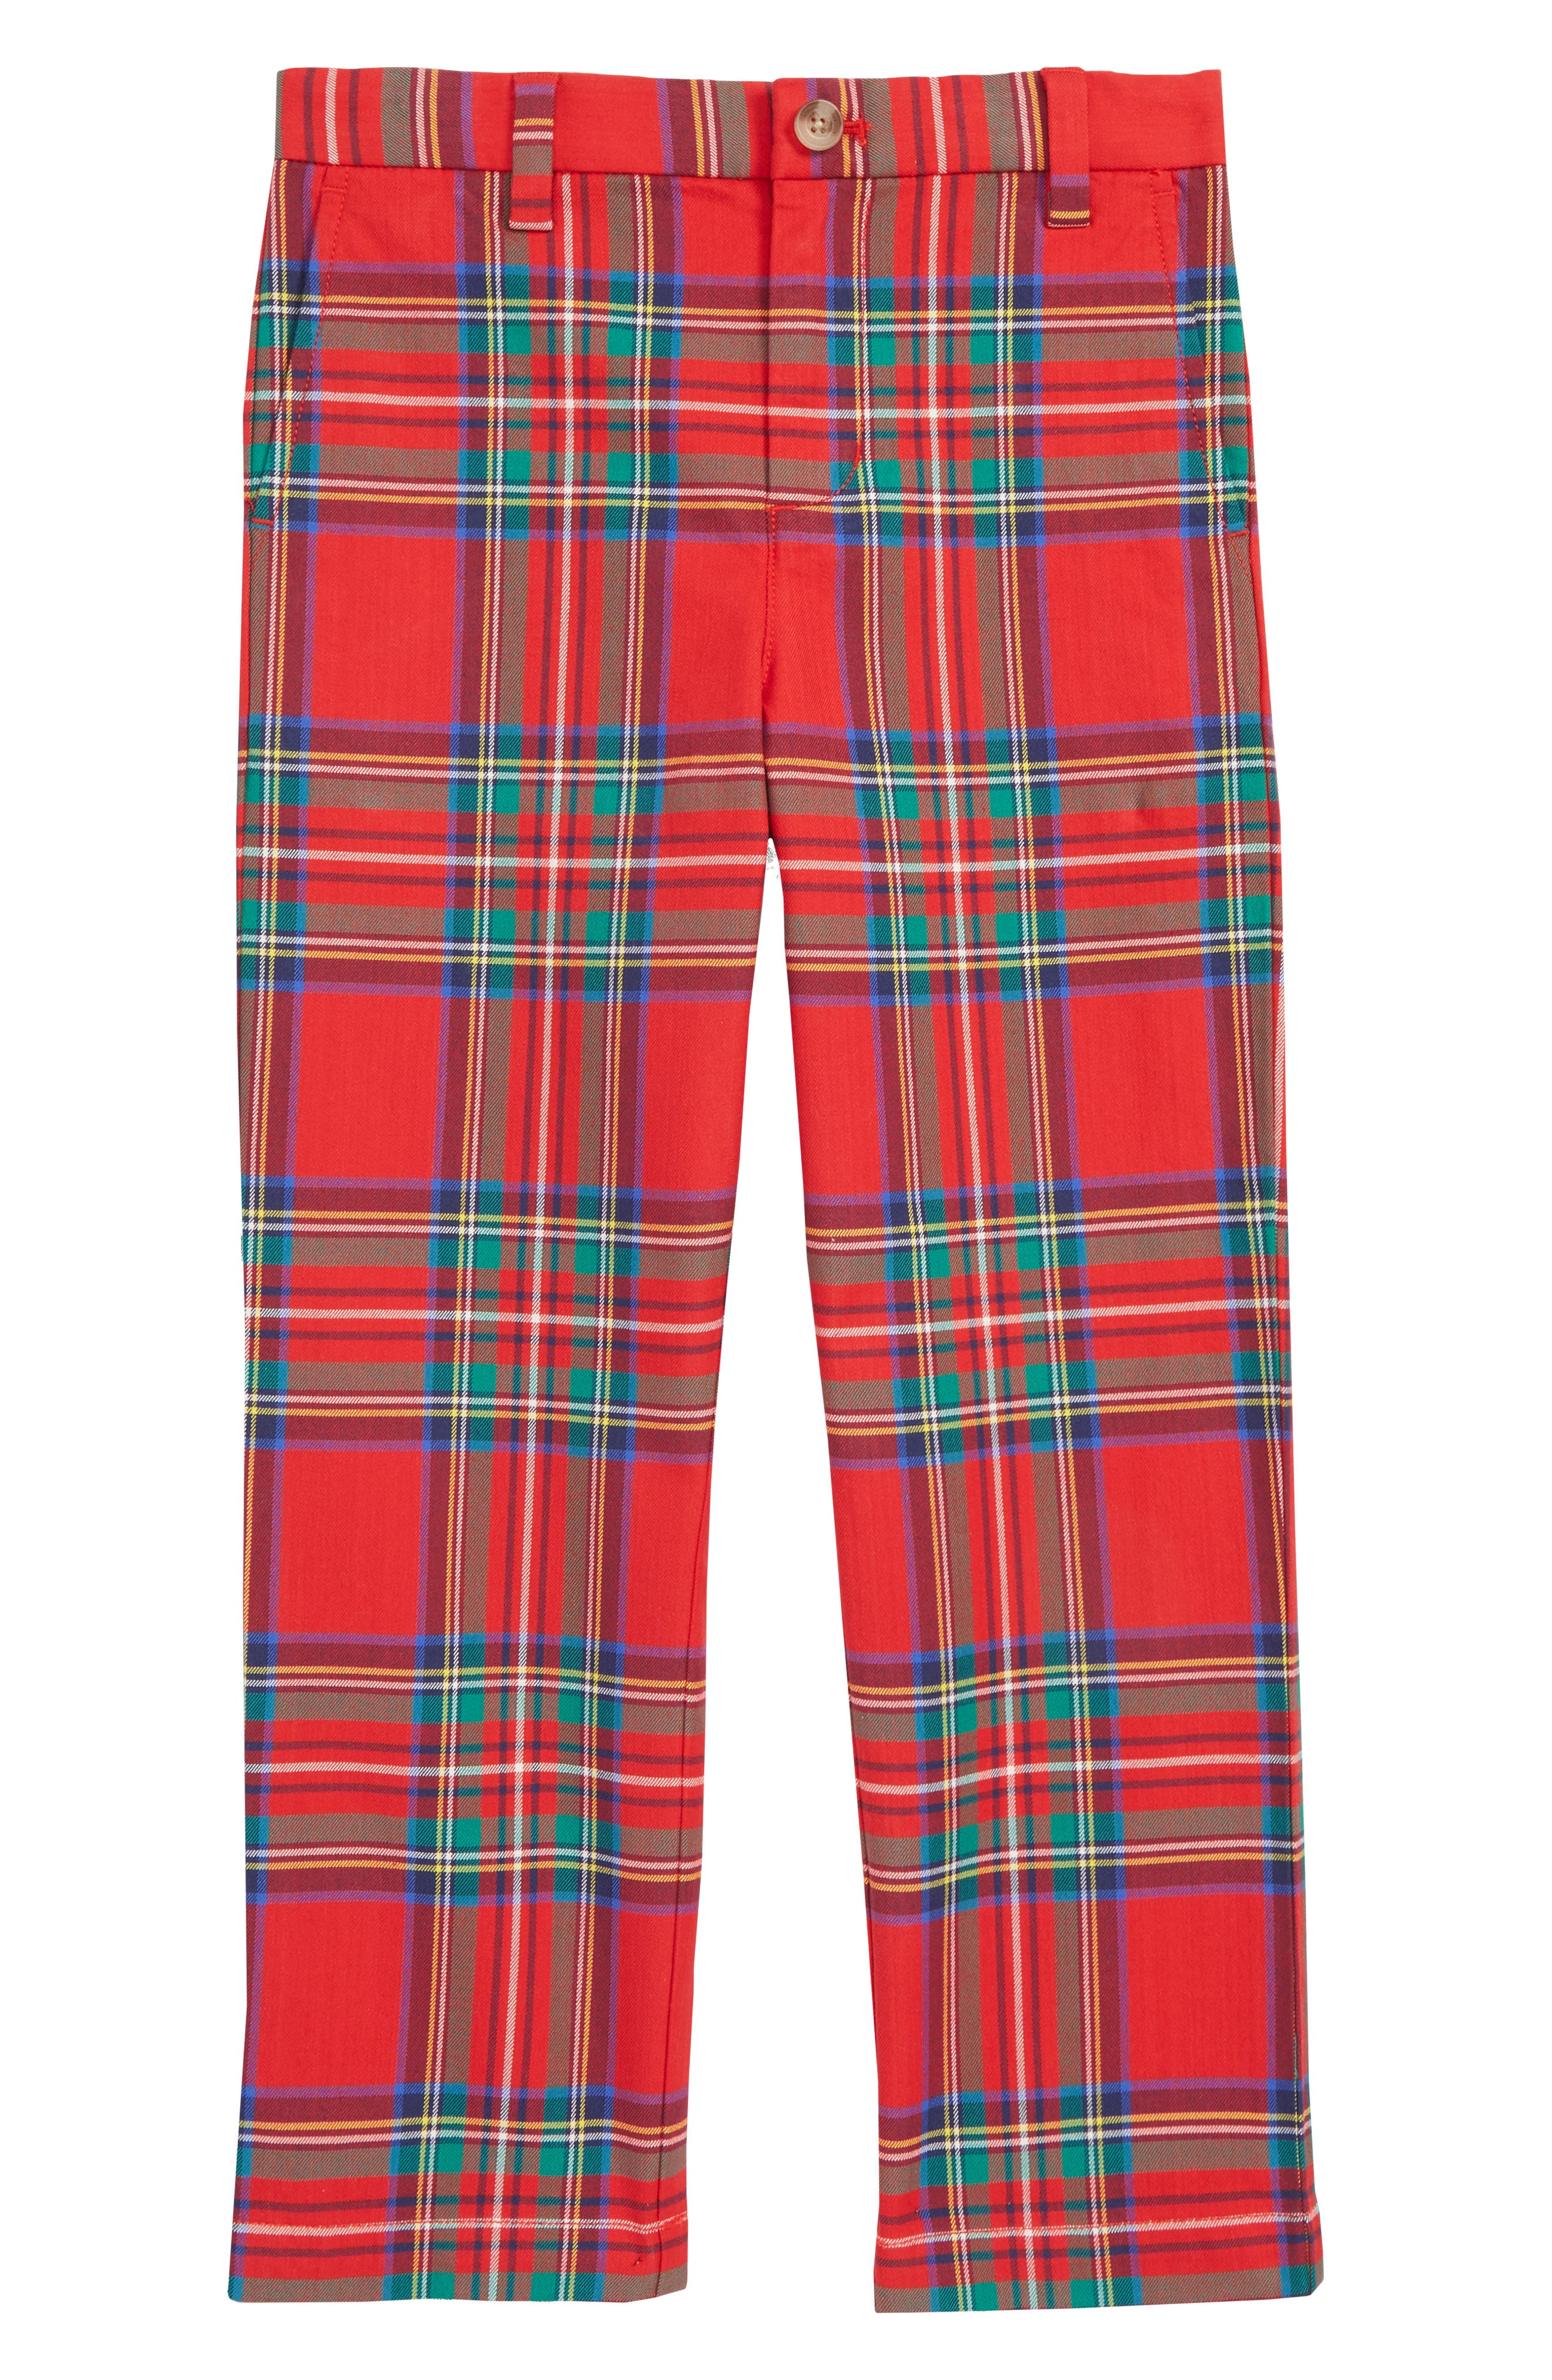 VINEYARD VINES Jolly Plaid Breaker Pants, Main, color, 634